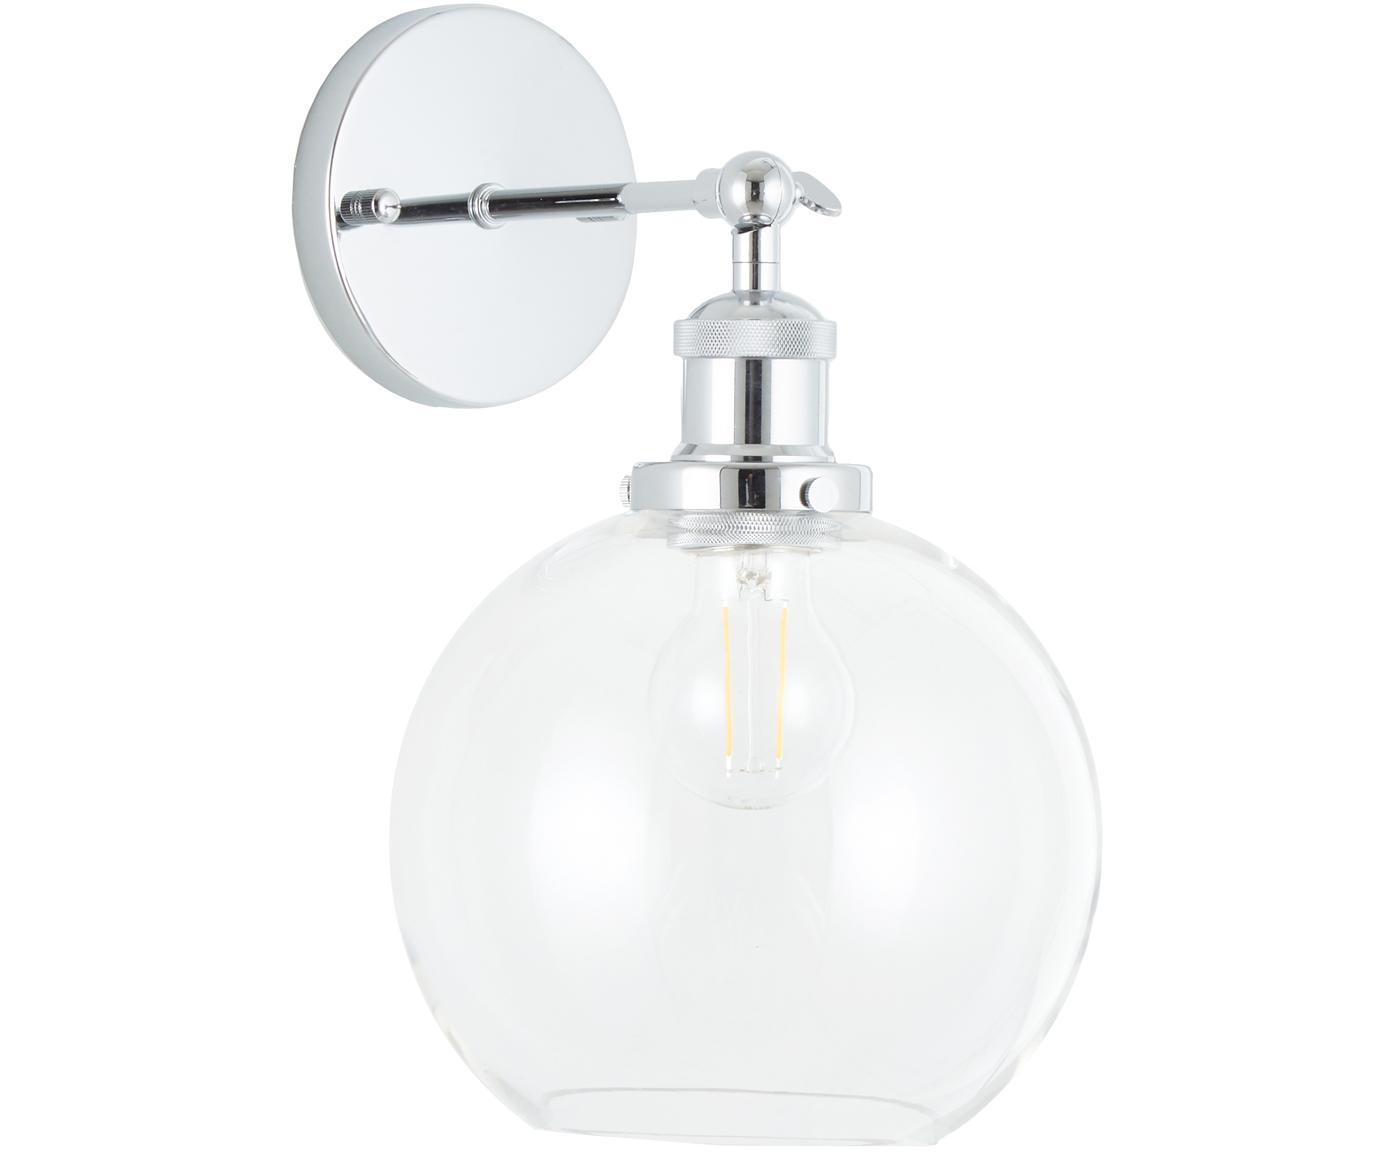 Wandlamp New York Loft No.2, Lampenkap: glas, Chroomkleurig, transparant, 20 x 30 cm